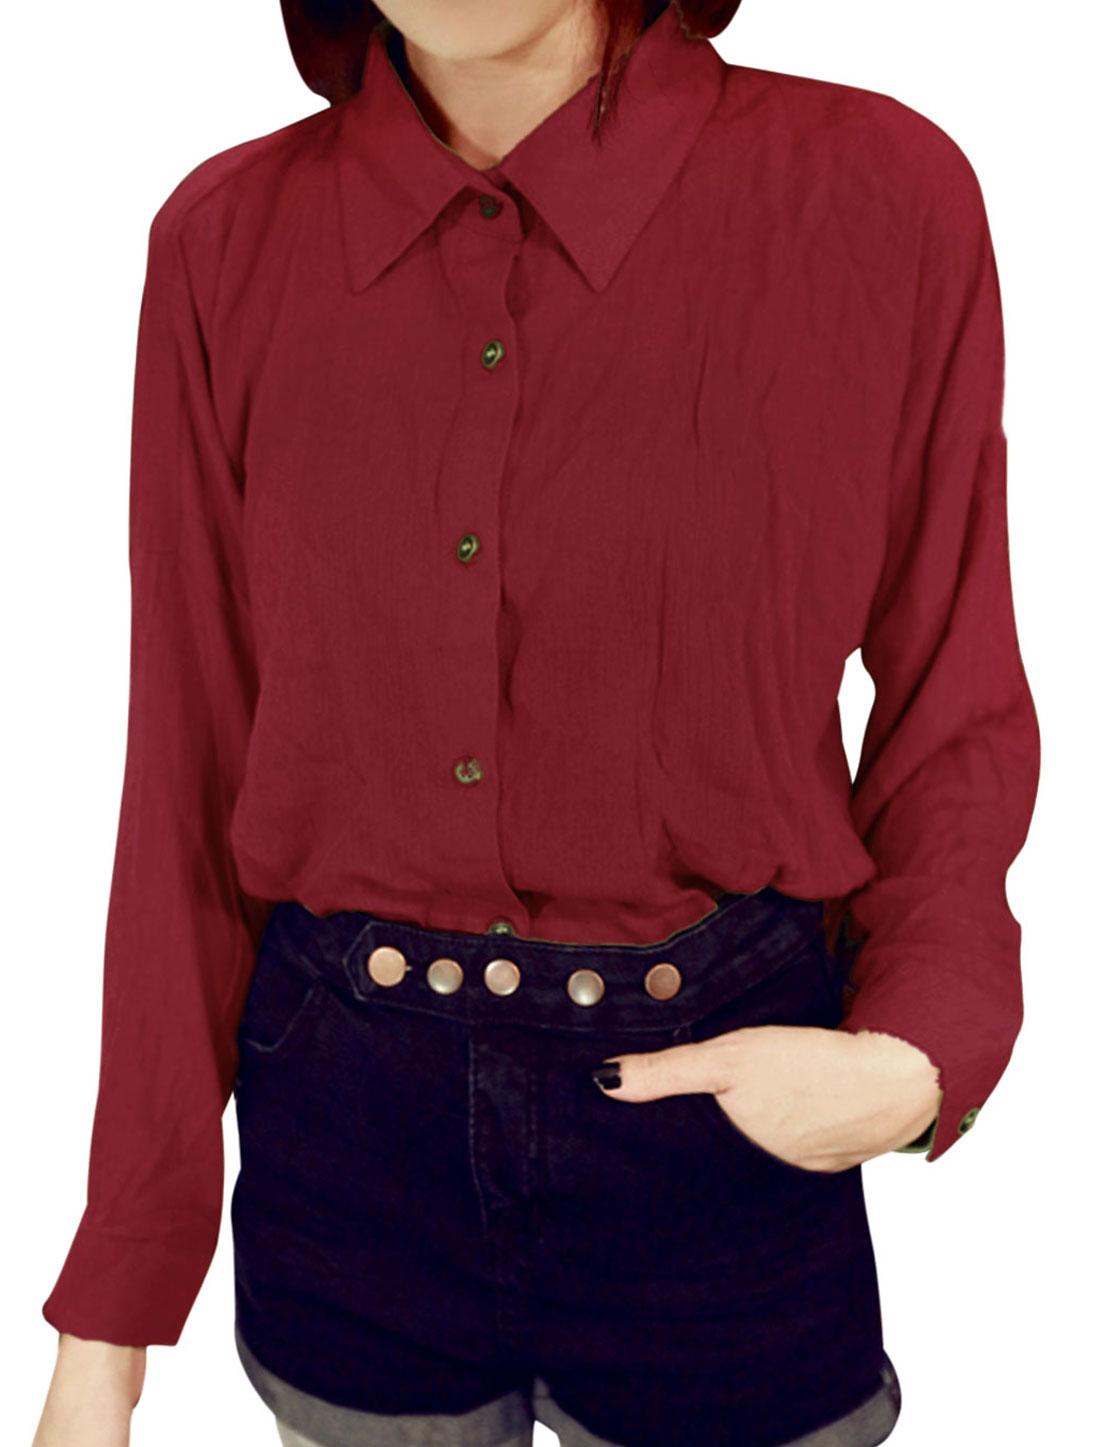 Lady Button Closure Front Button Cuffs Leisure Shirt Burgundy XS